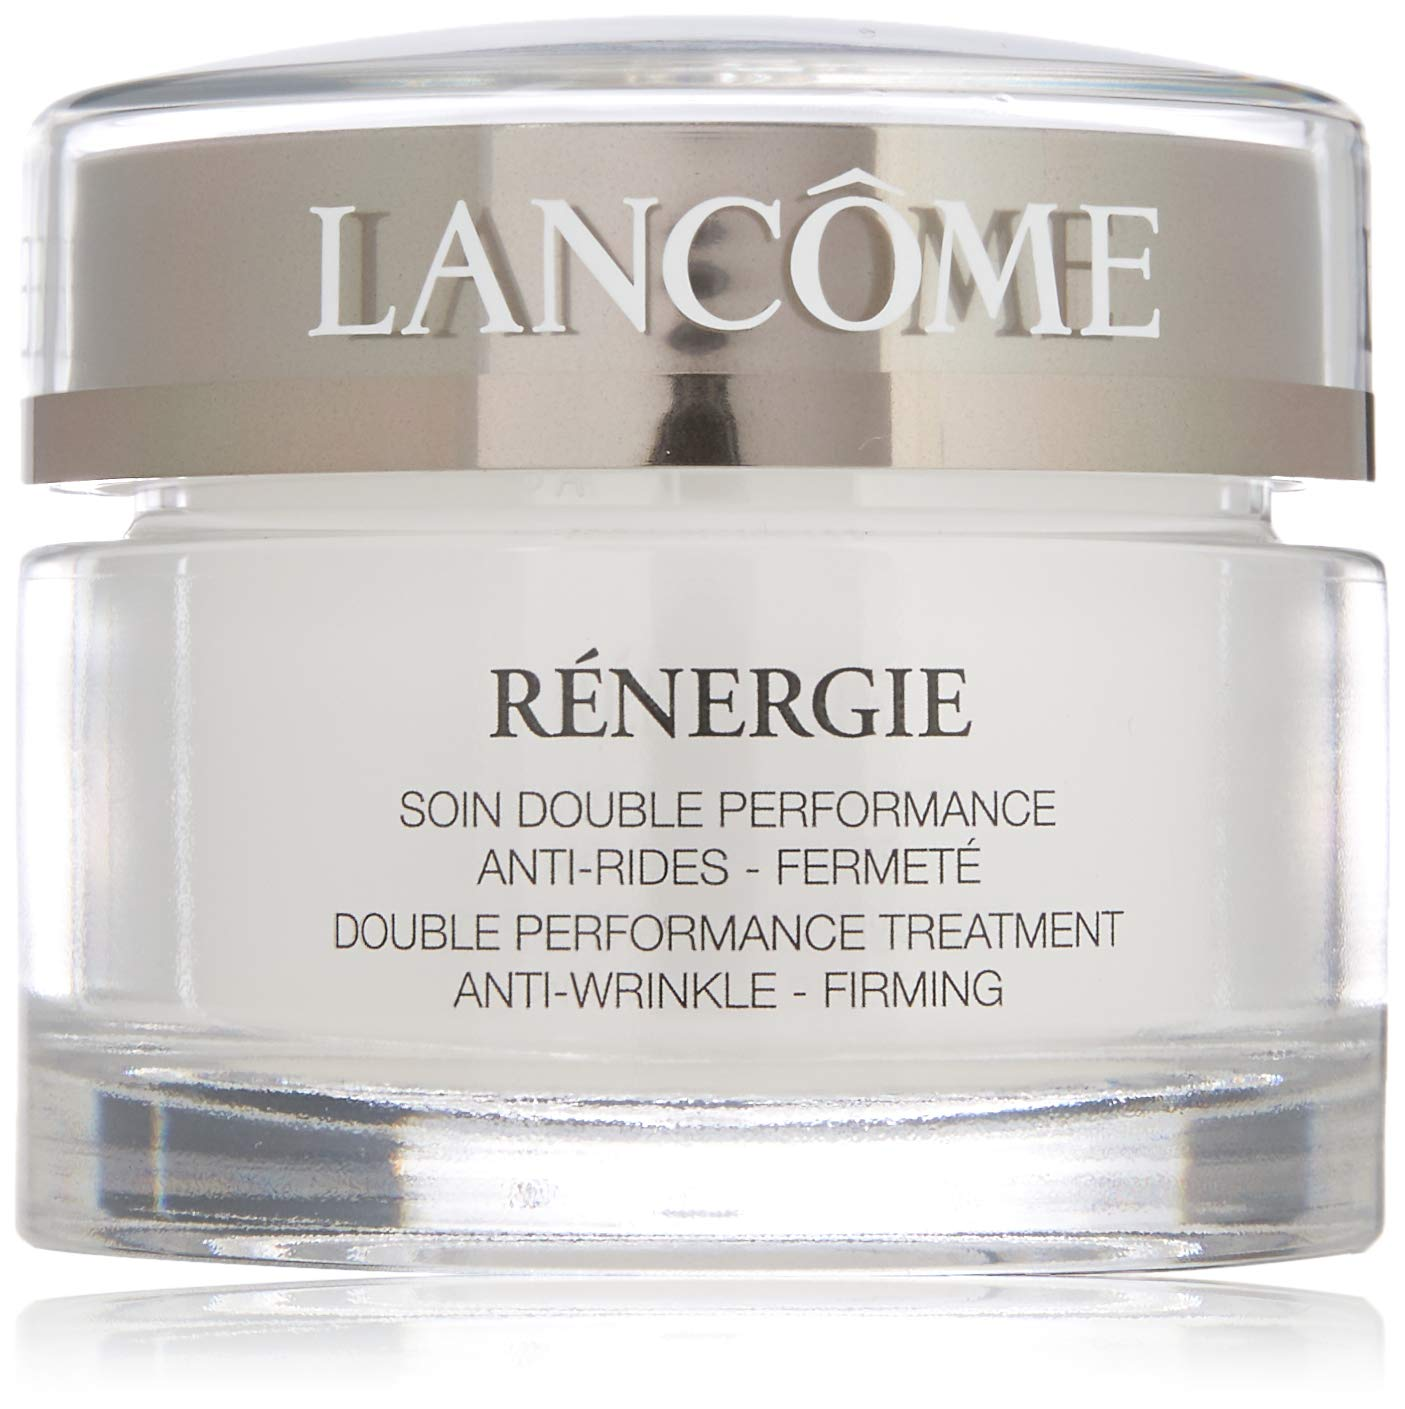 Lancome Renergie Crema 50 ml